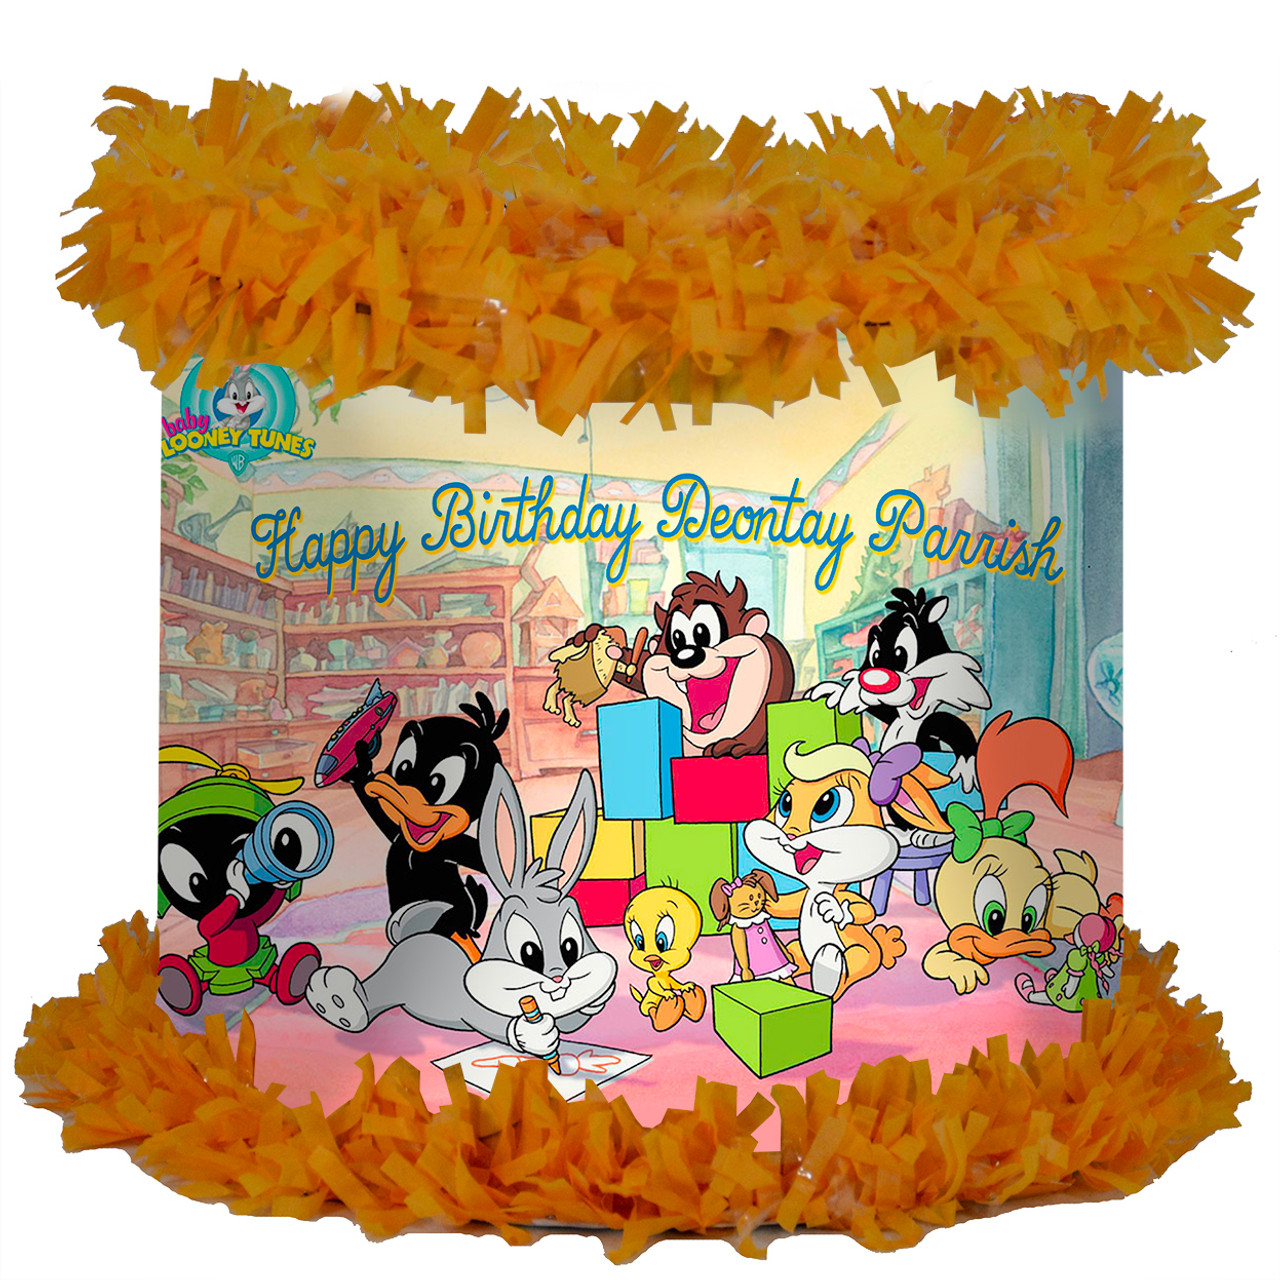 Baby Looney Tunes Personalized Pinata Worldofpinatas Com